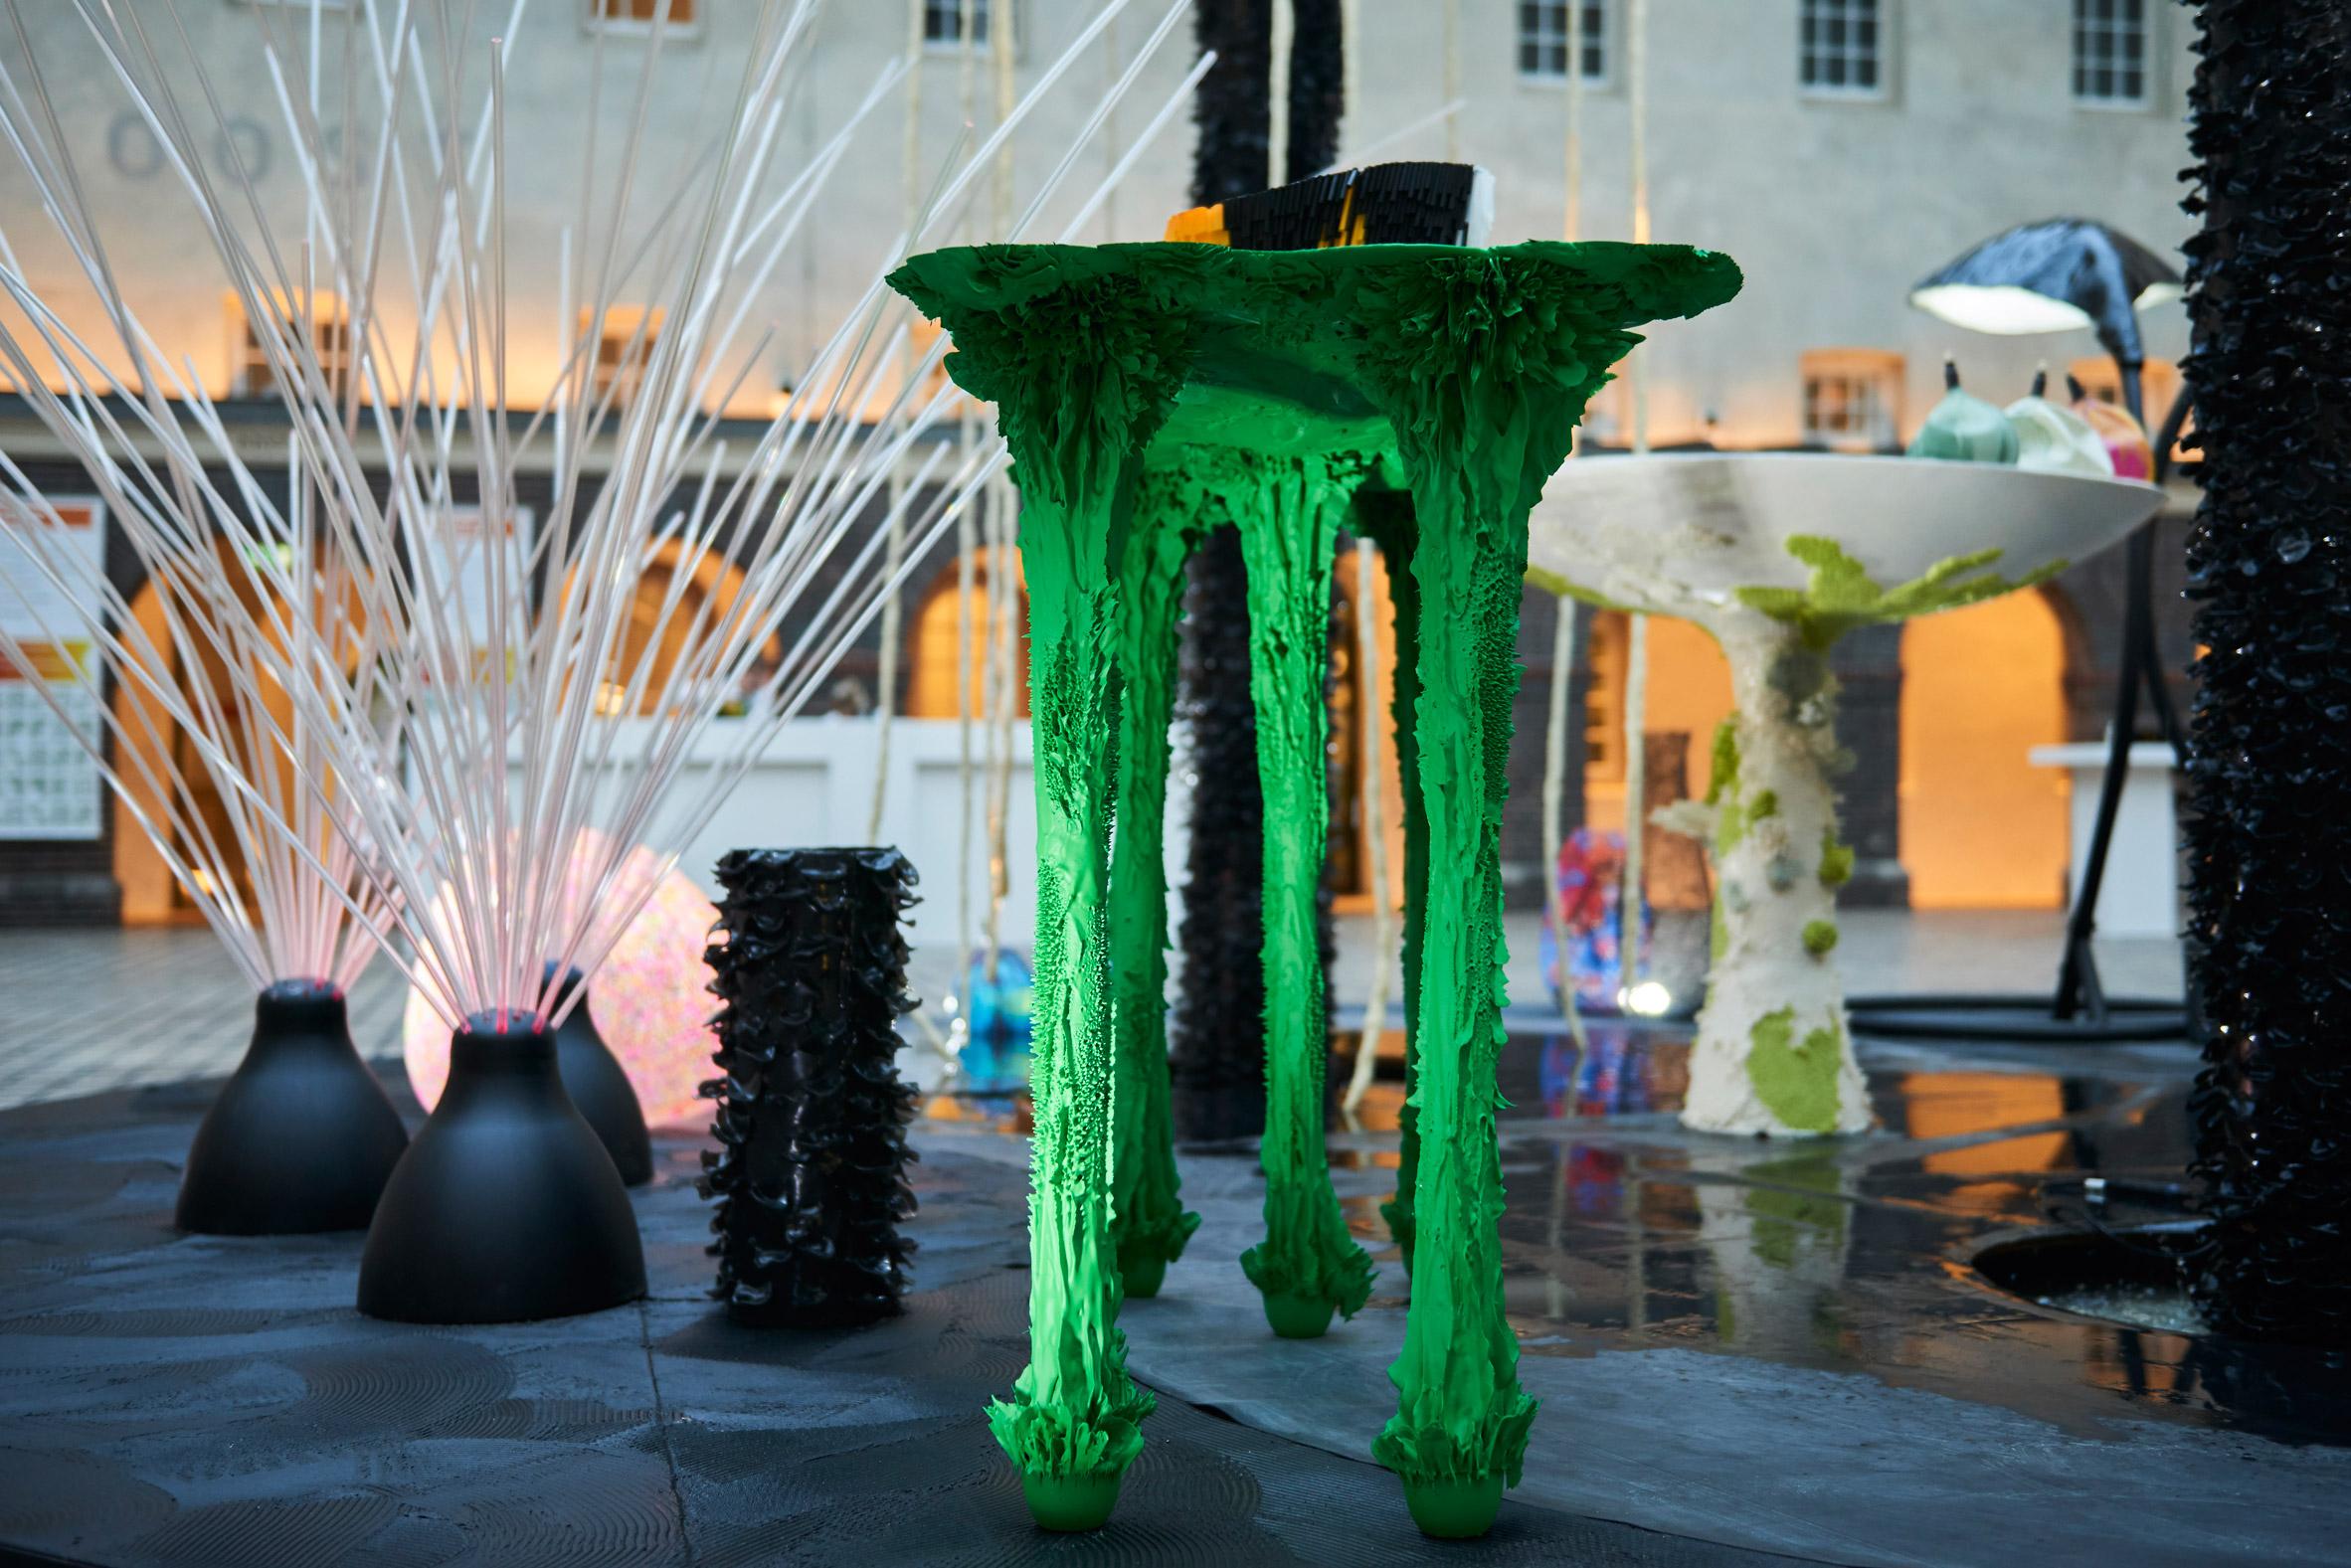 Water Bench Tropic City project by Jolan van der Wiel